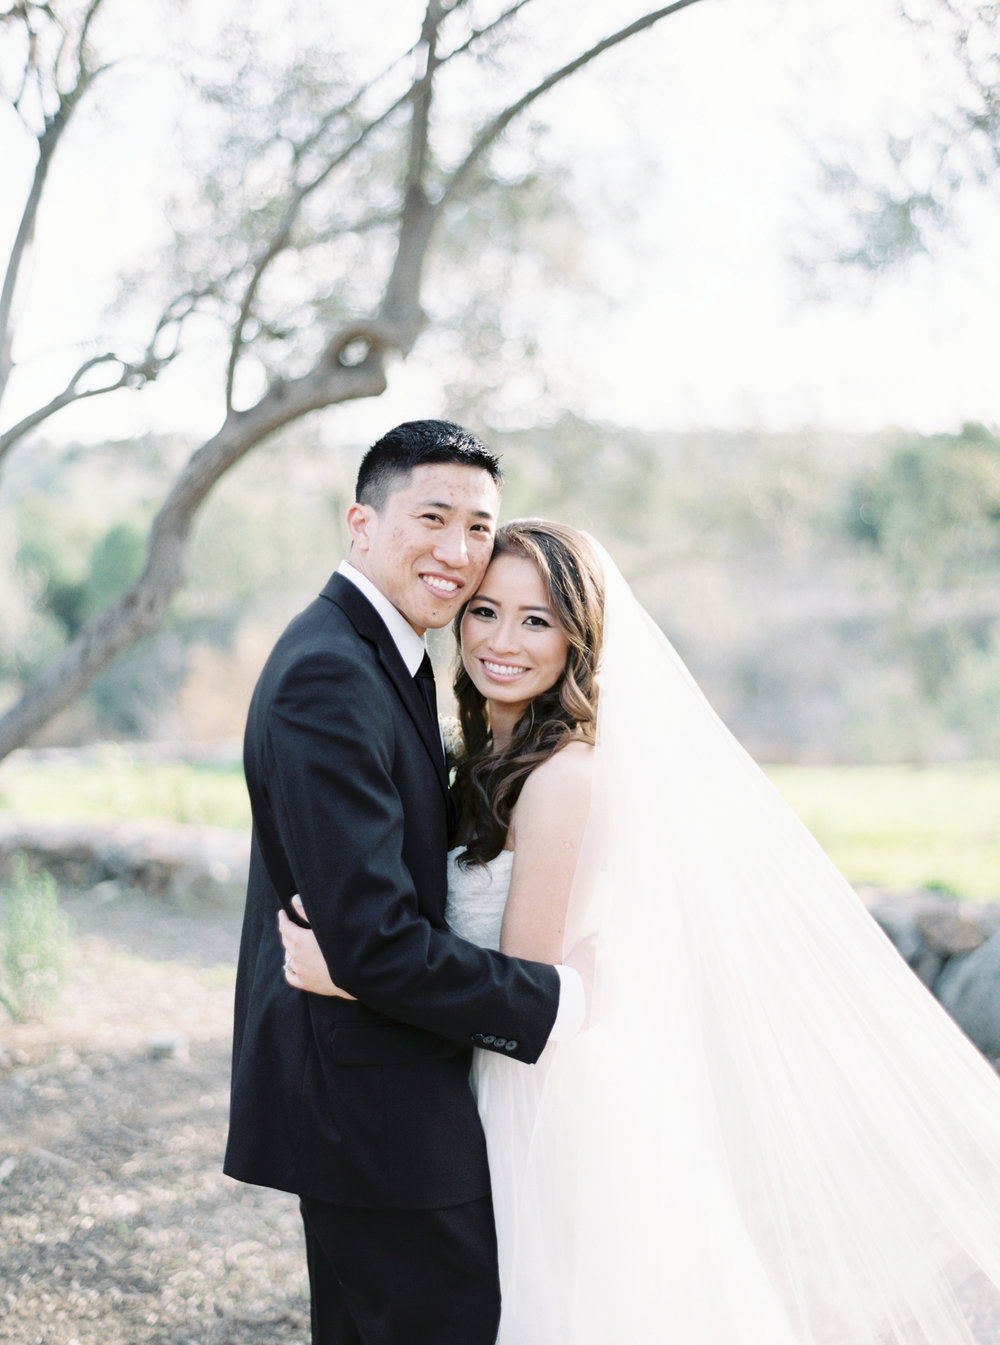 San Diego fine art wedding photographer | San Diego photographer | San Diego film photographer | Whiskers and Willow Photography